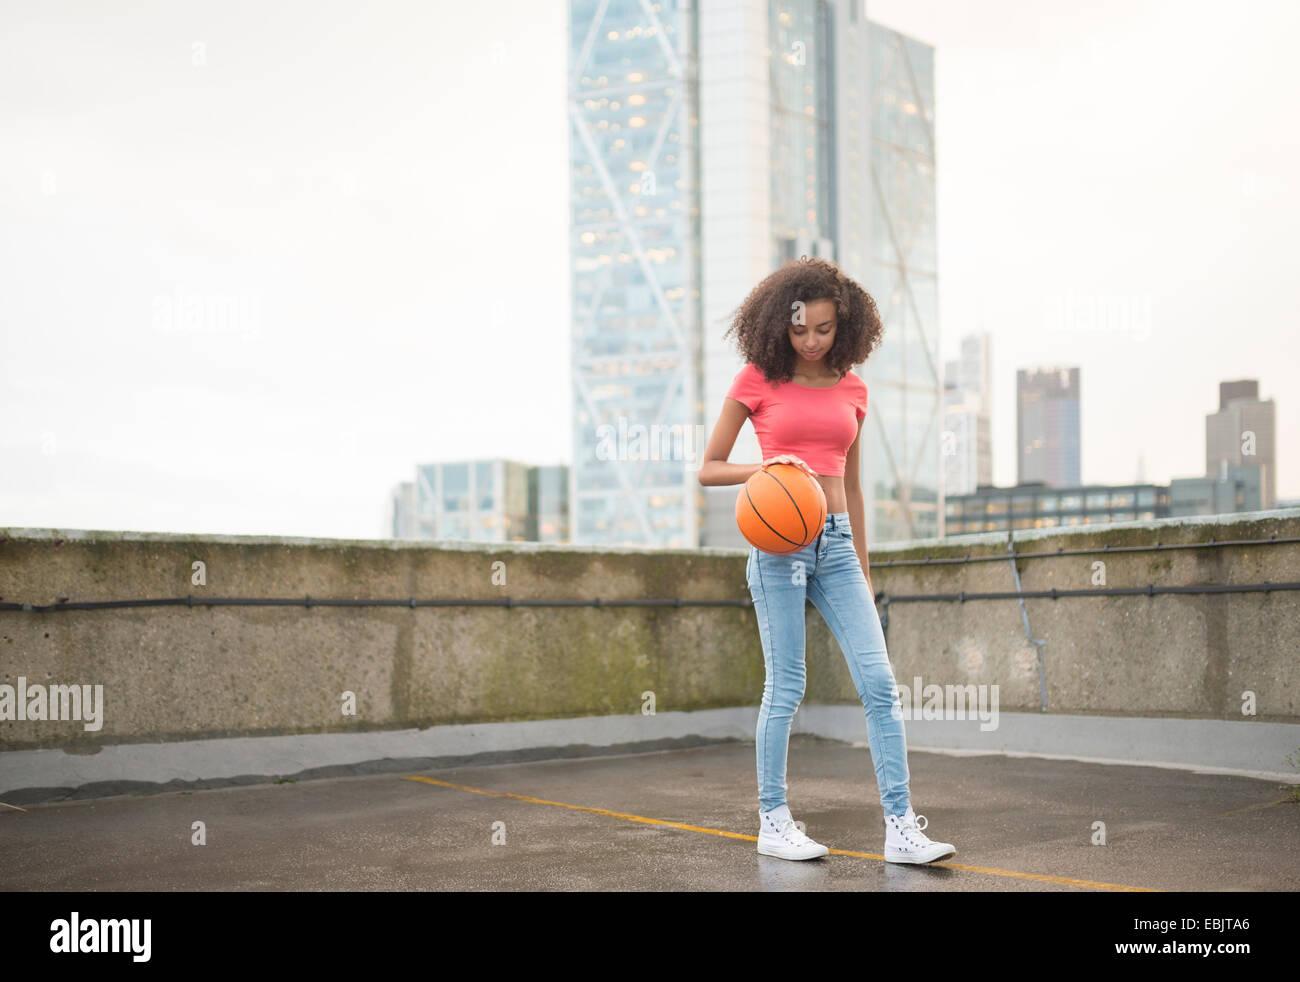 Young woman bouncing basketball - Stock Image